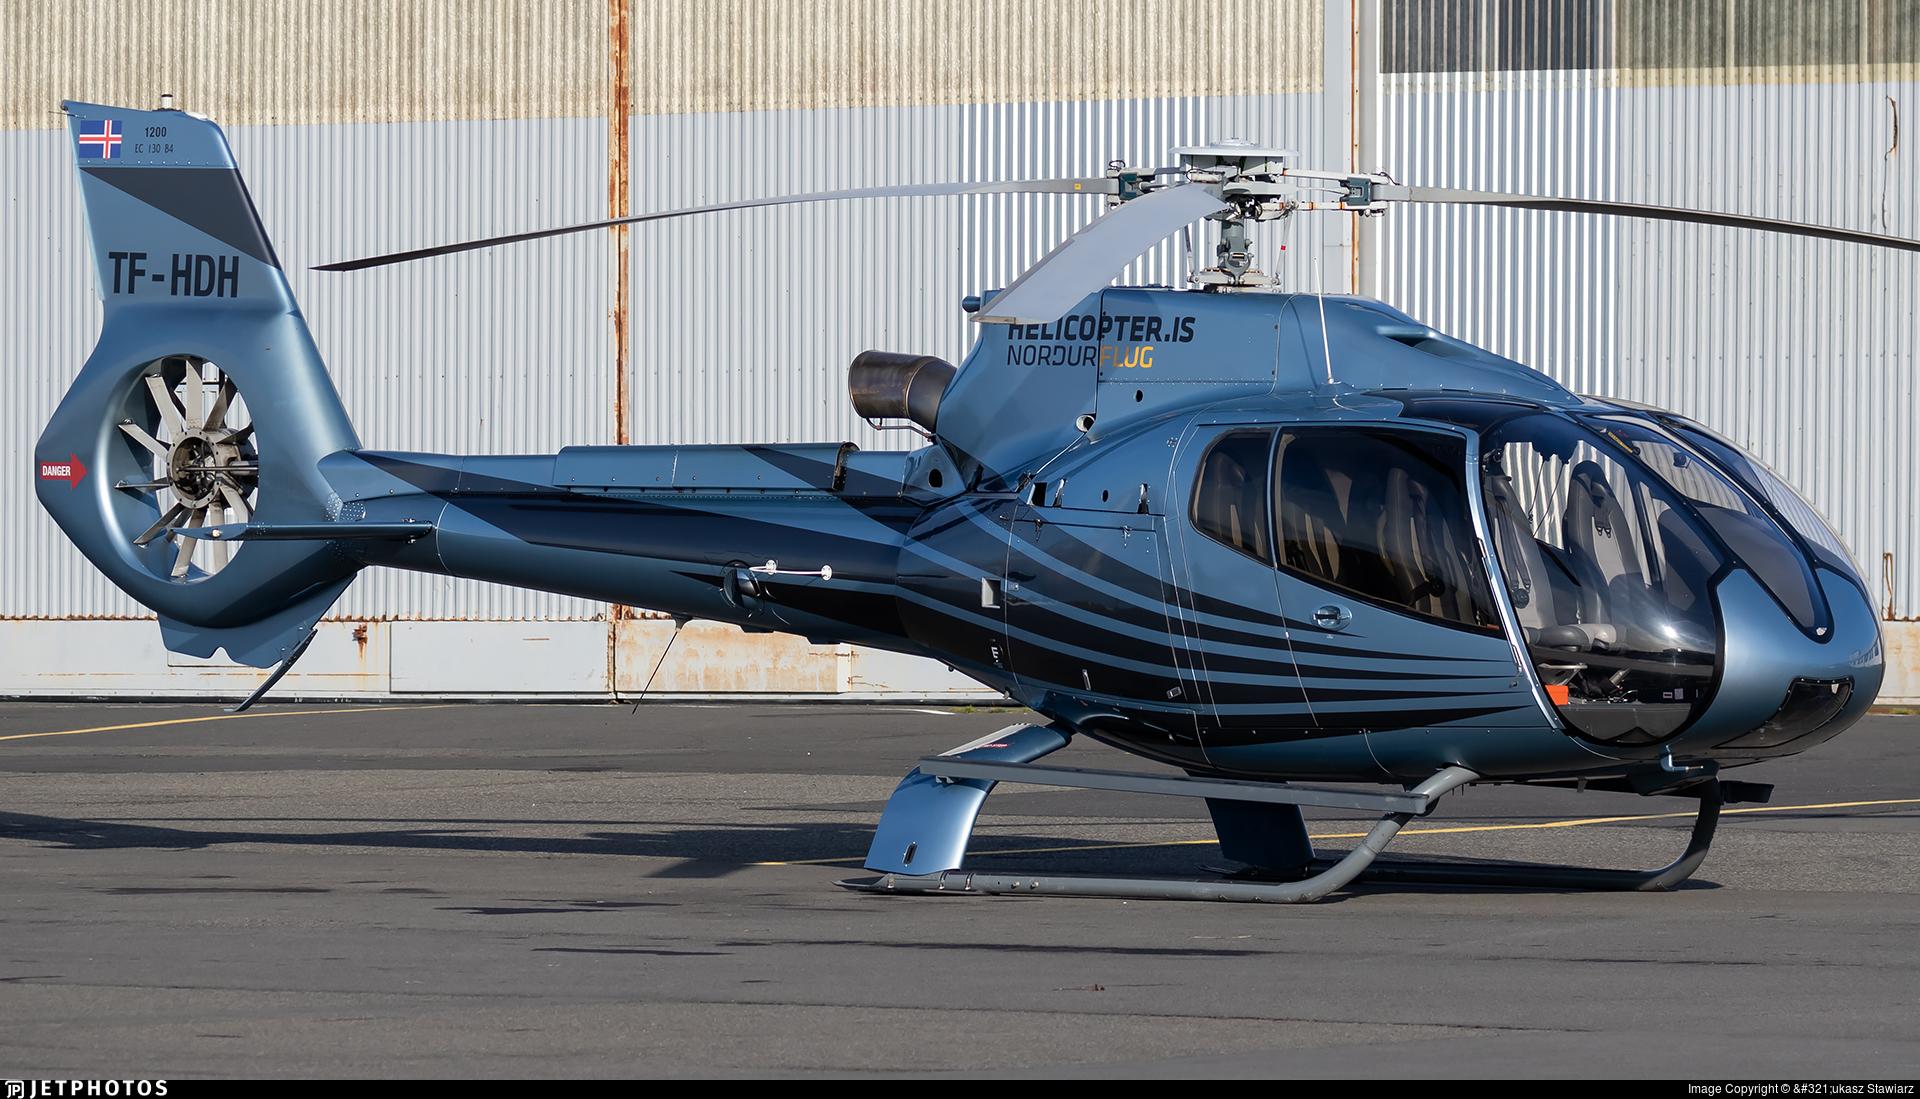 TF-HDH - Eurocopter EC 130B4 - Nordurflug Helicopter